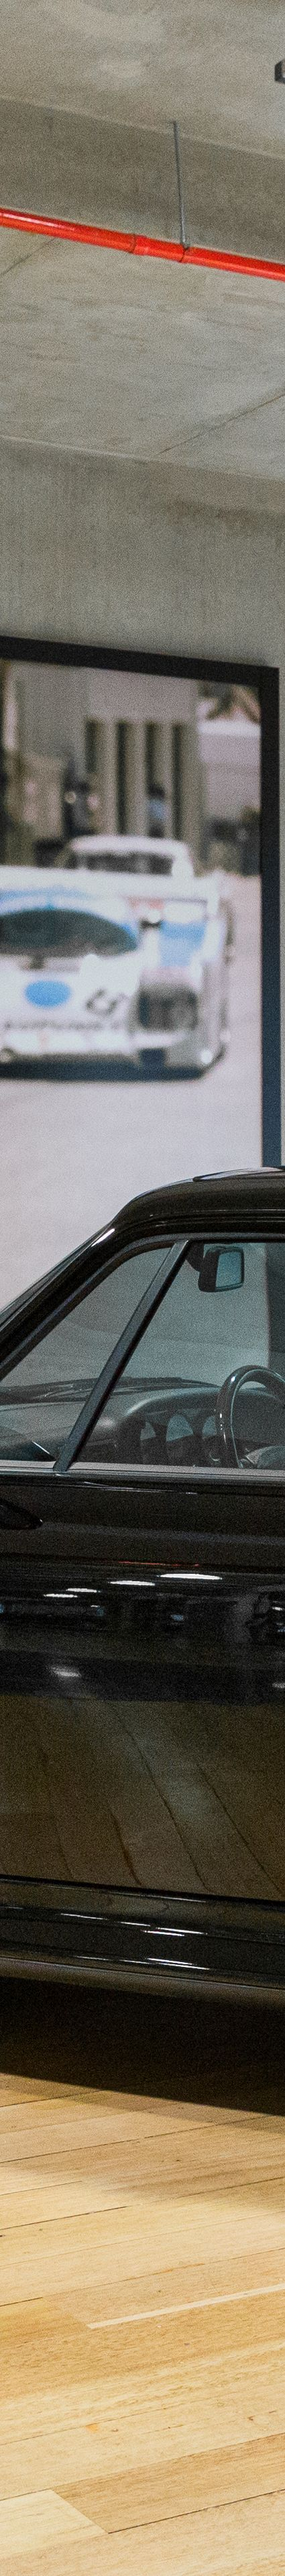 1998 Porsche  911 993 Turbo S- sold in Australia